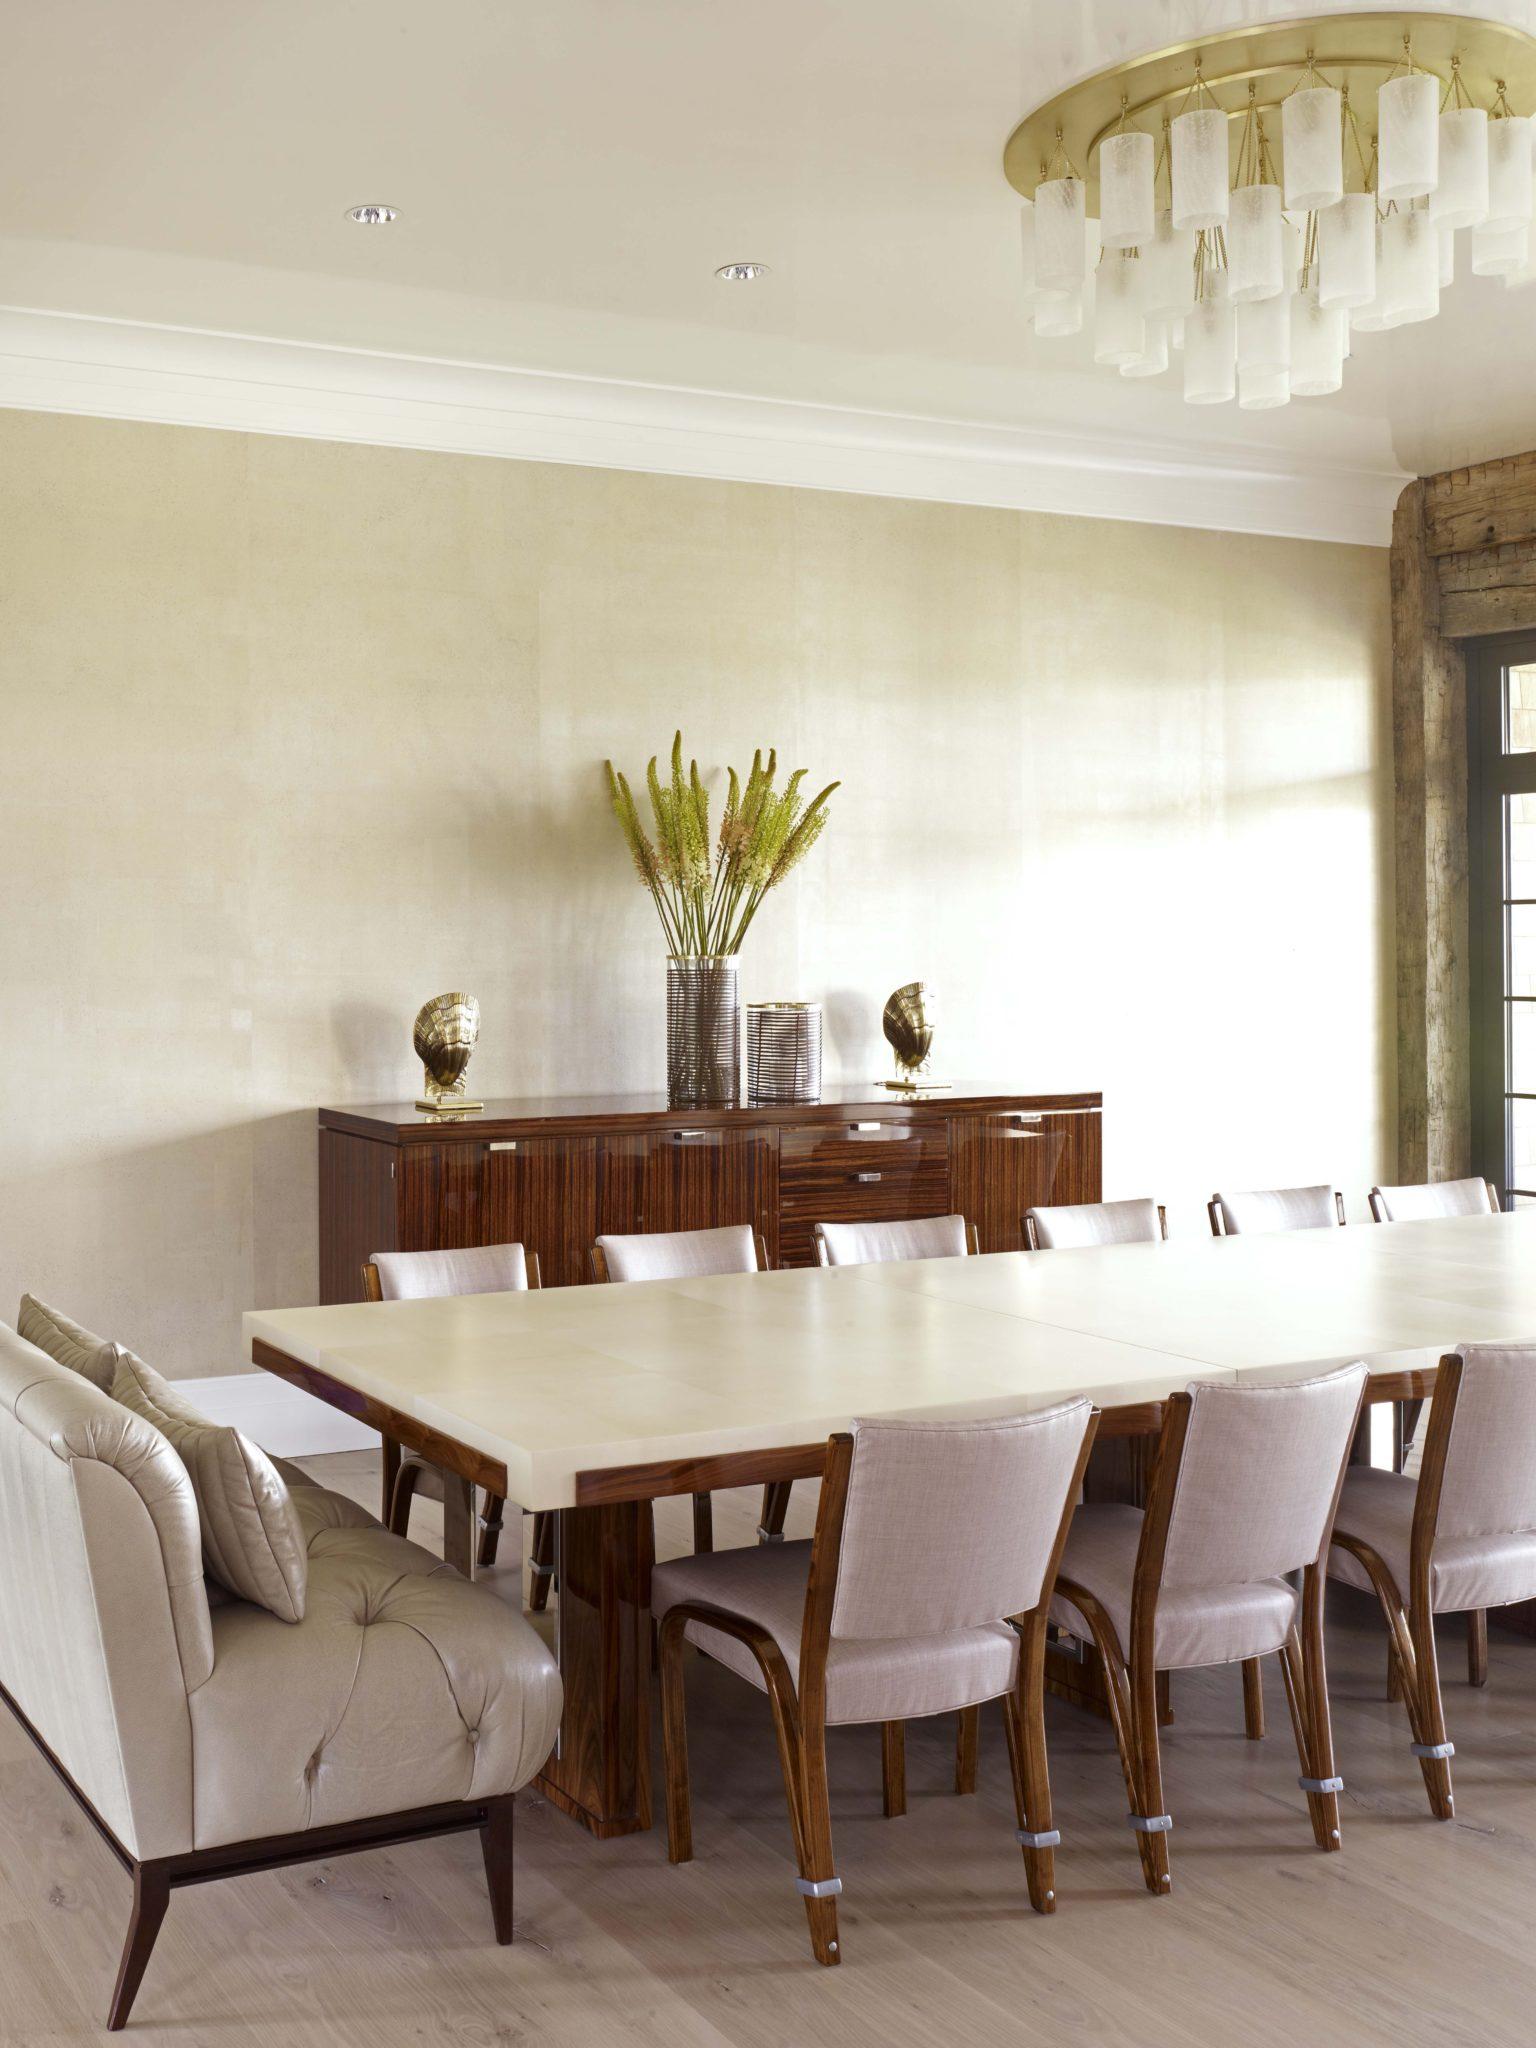 Bridgehampton Residence, Dining Room w/ artisan lighting by Stephens Design Group